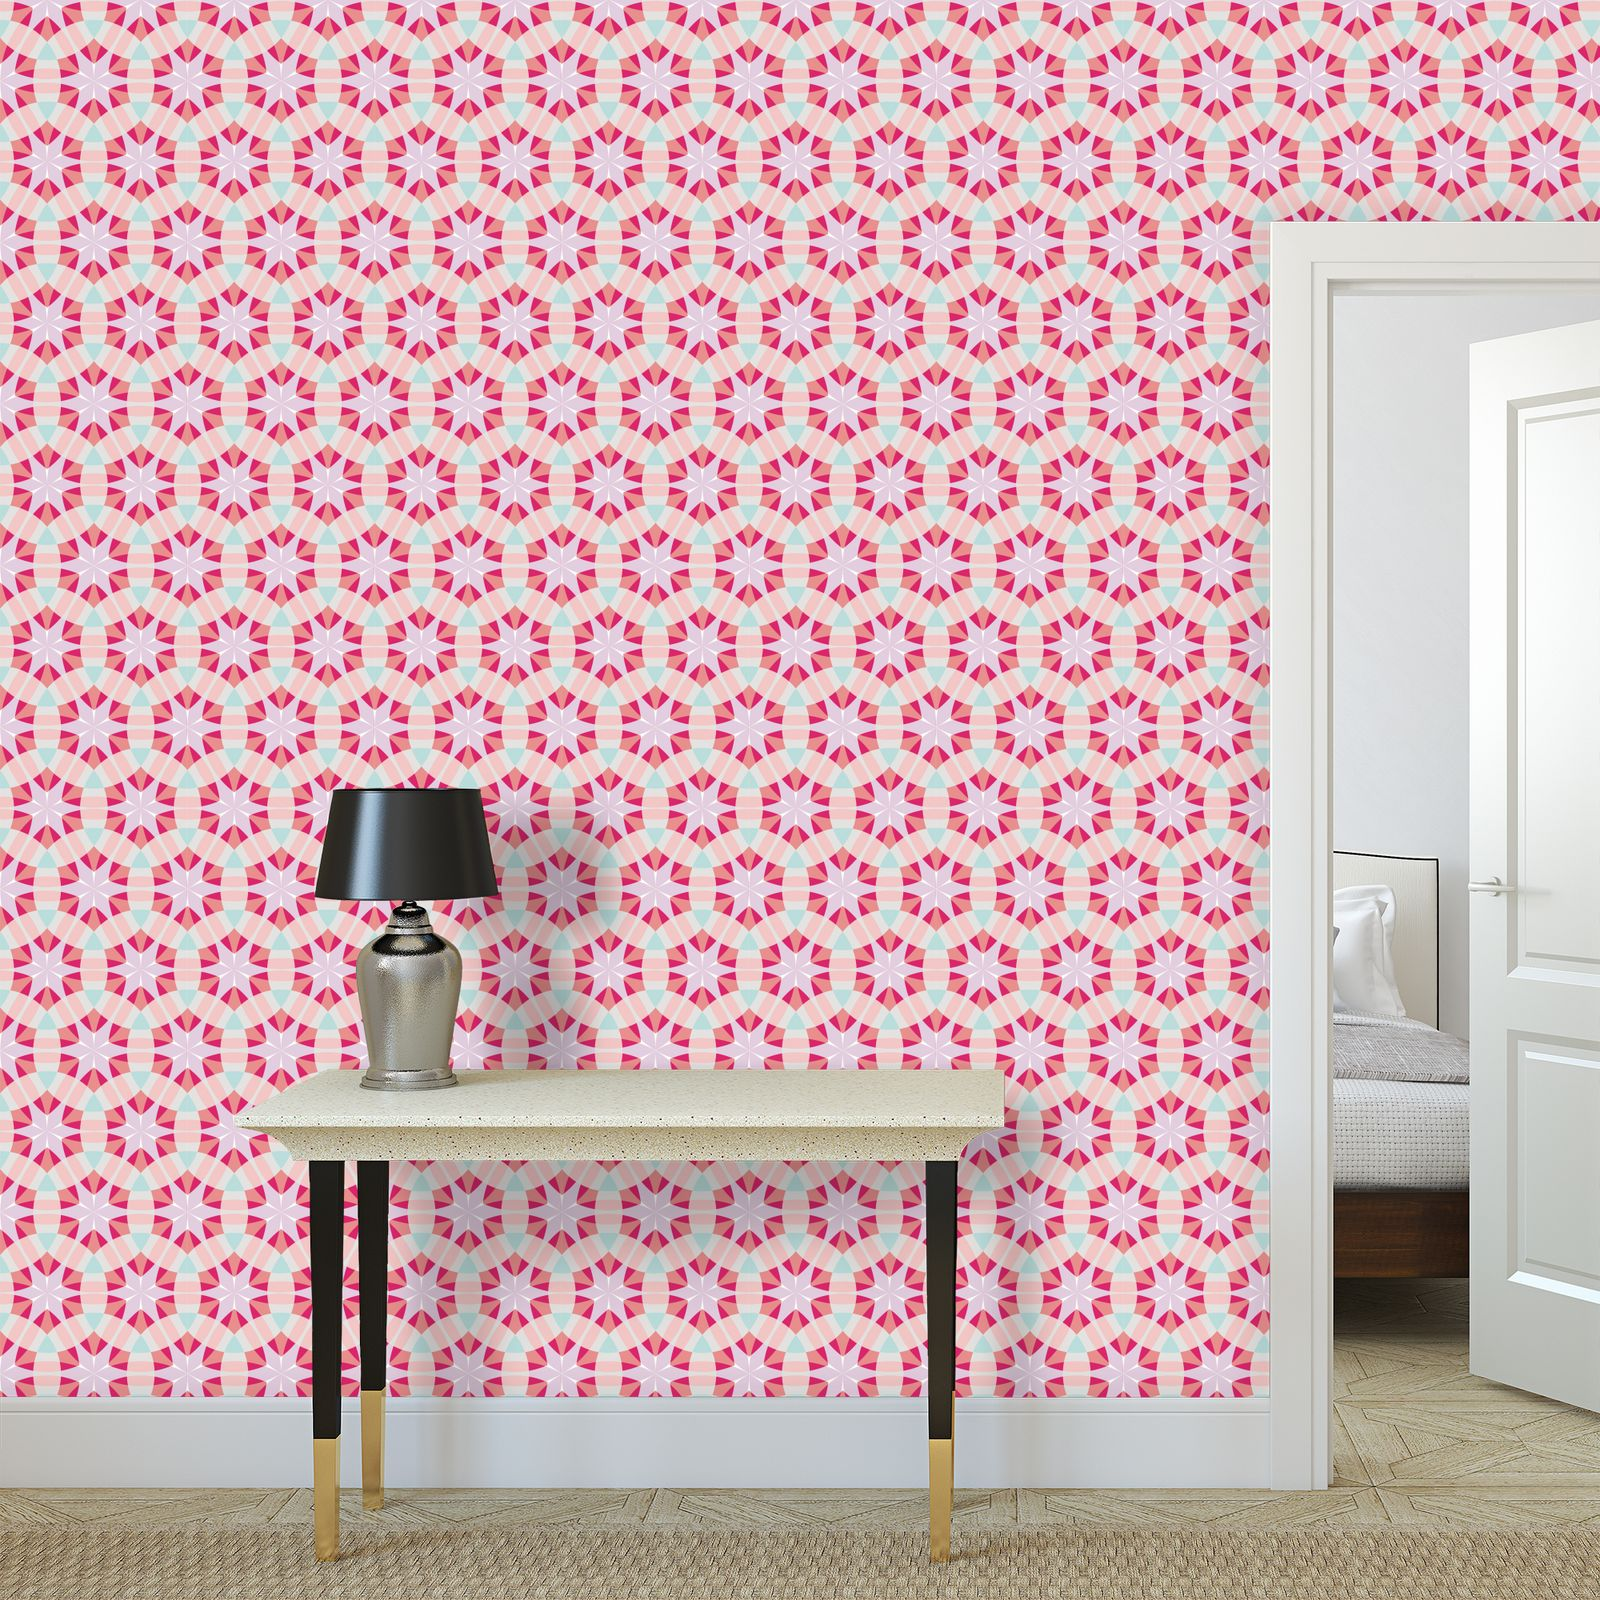 Wallpaper Rolls Shapes 3